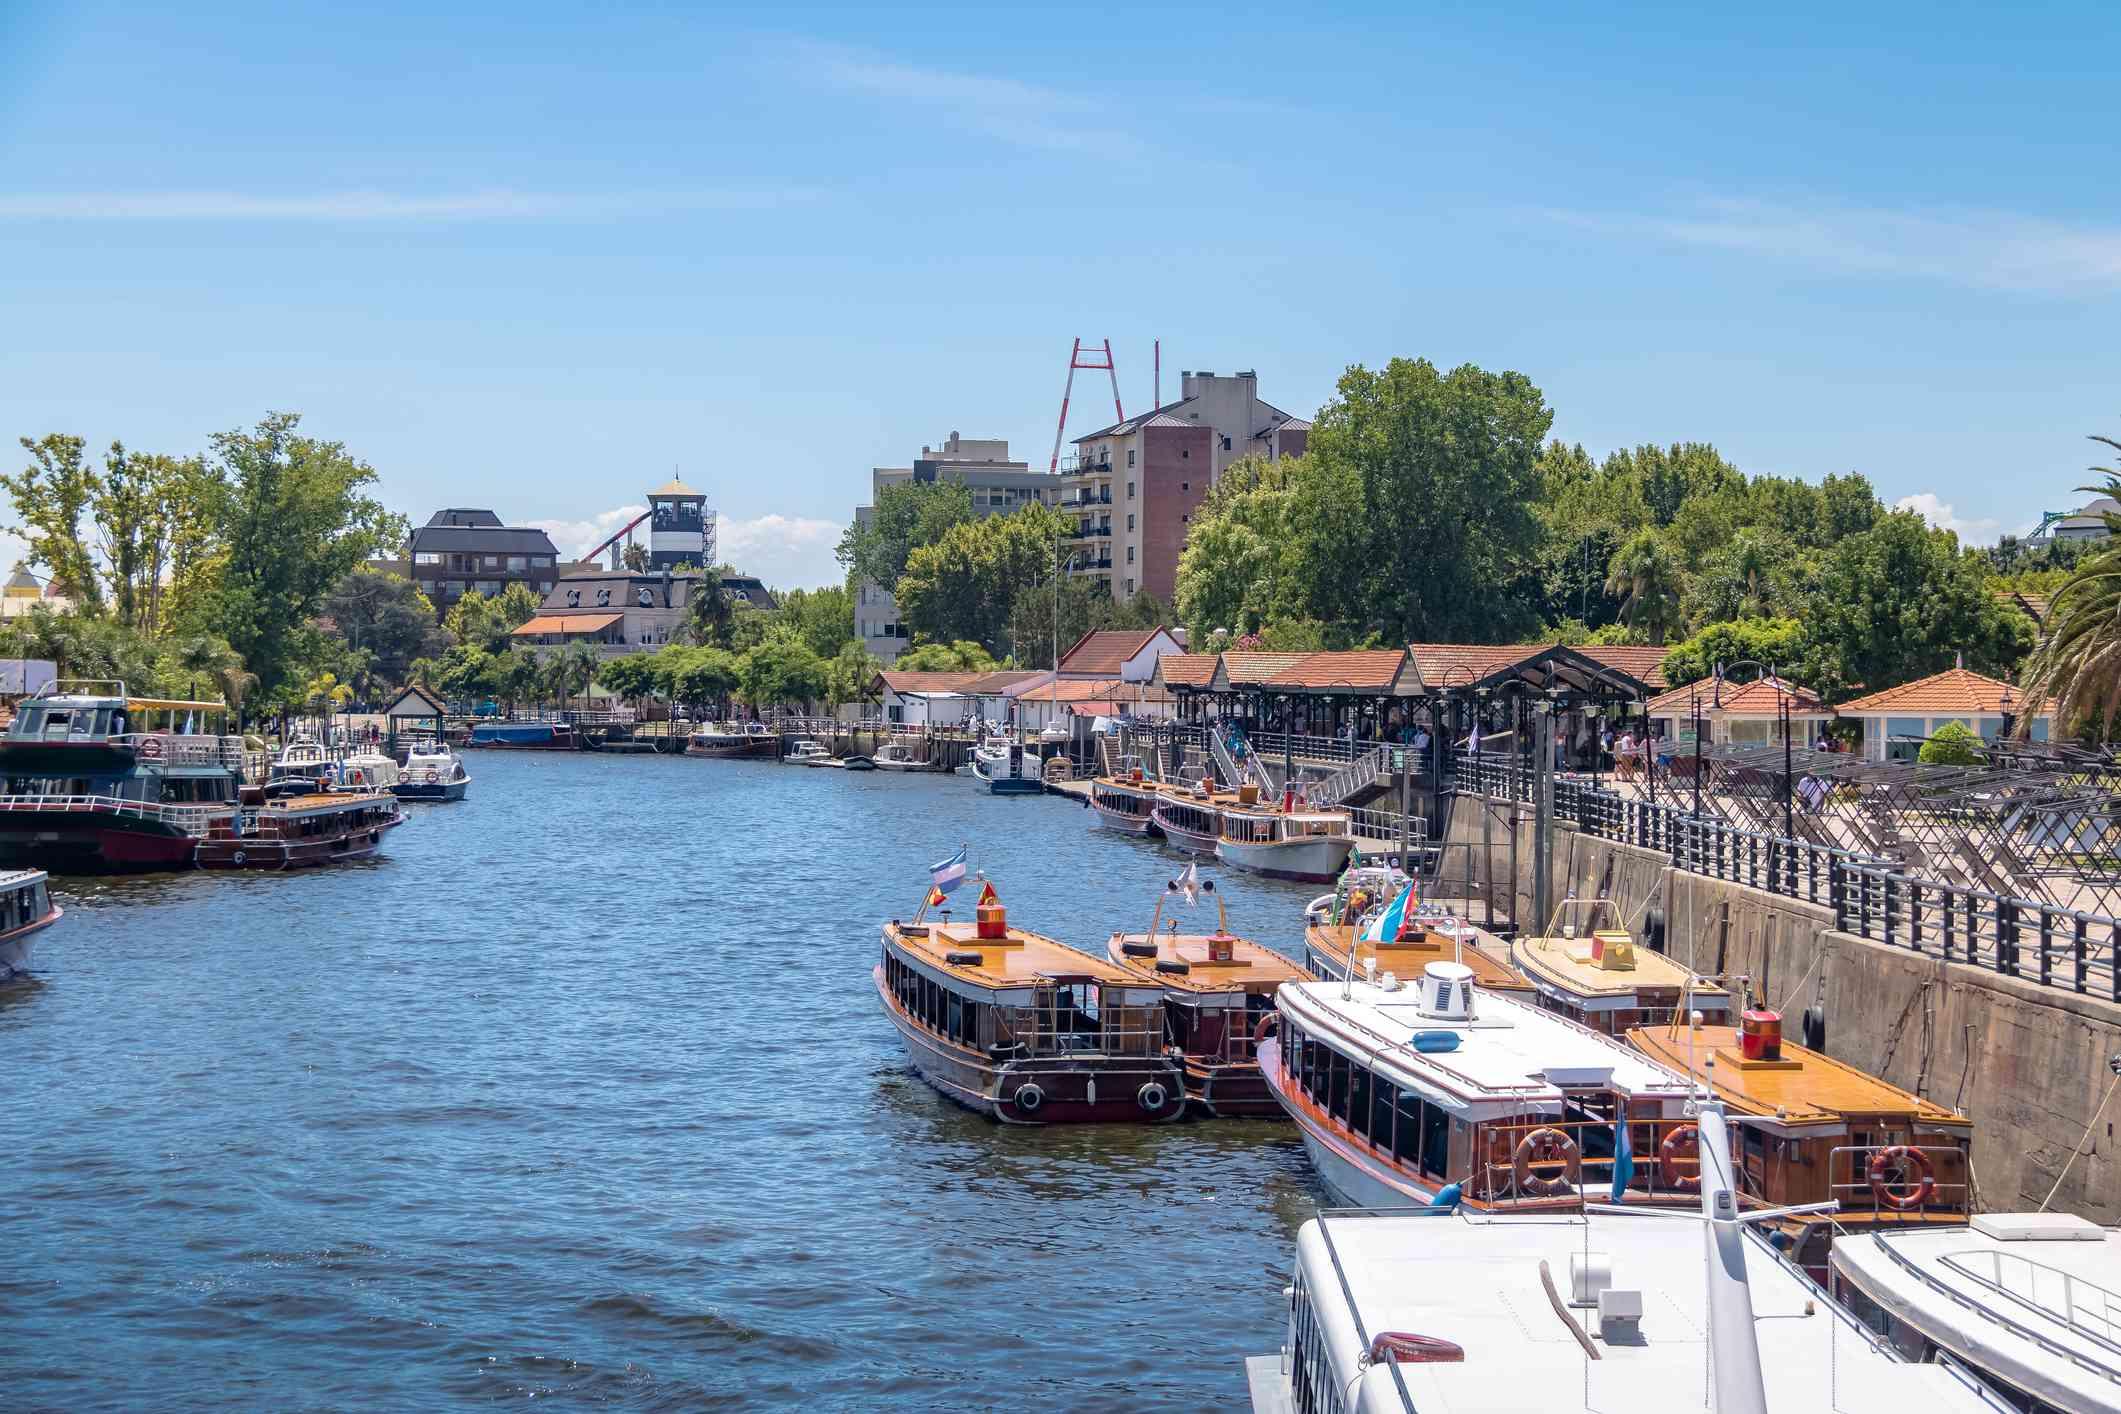 Boats at Tigre River - Tigre, Buenos Aires, Argentina